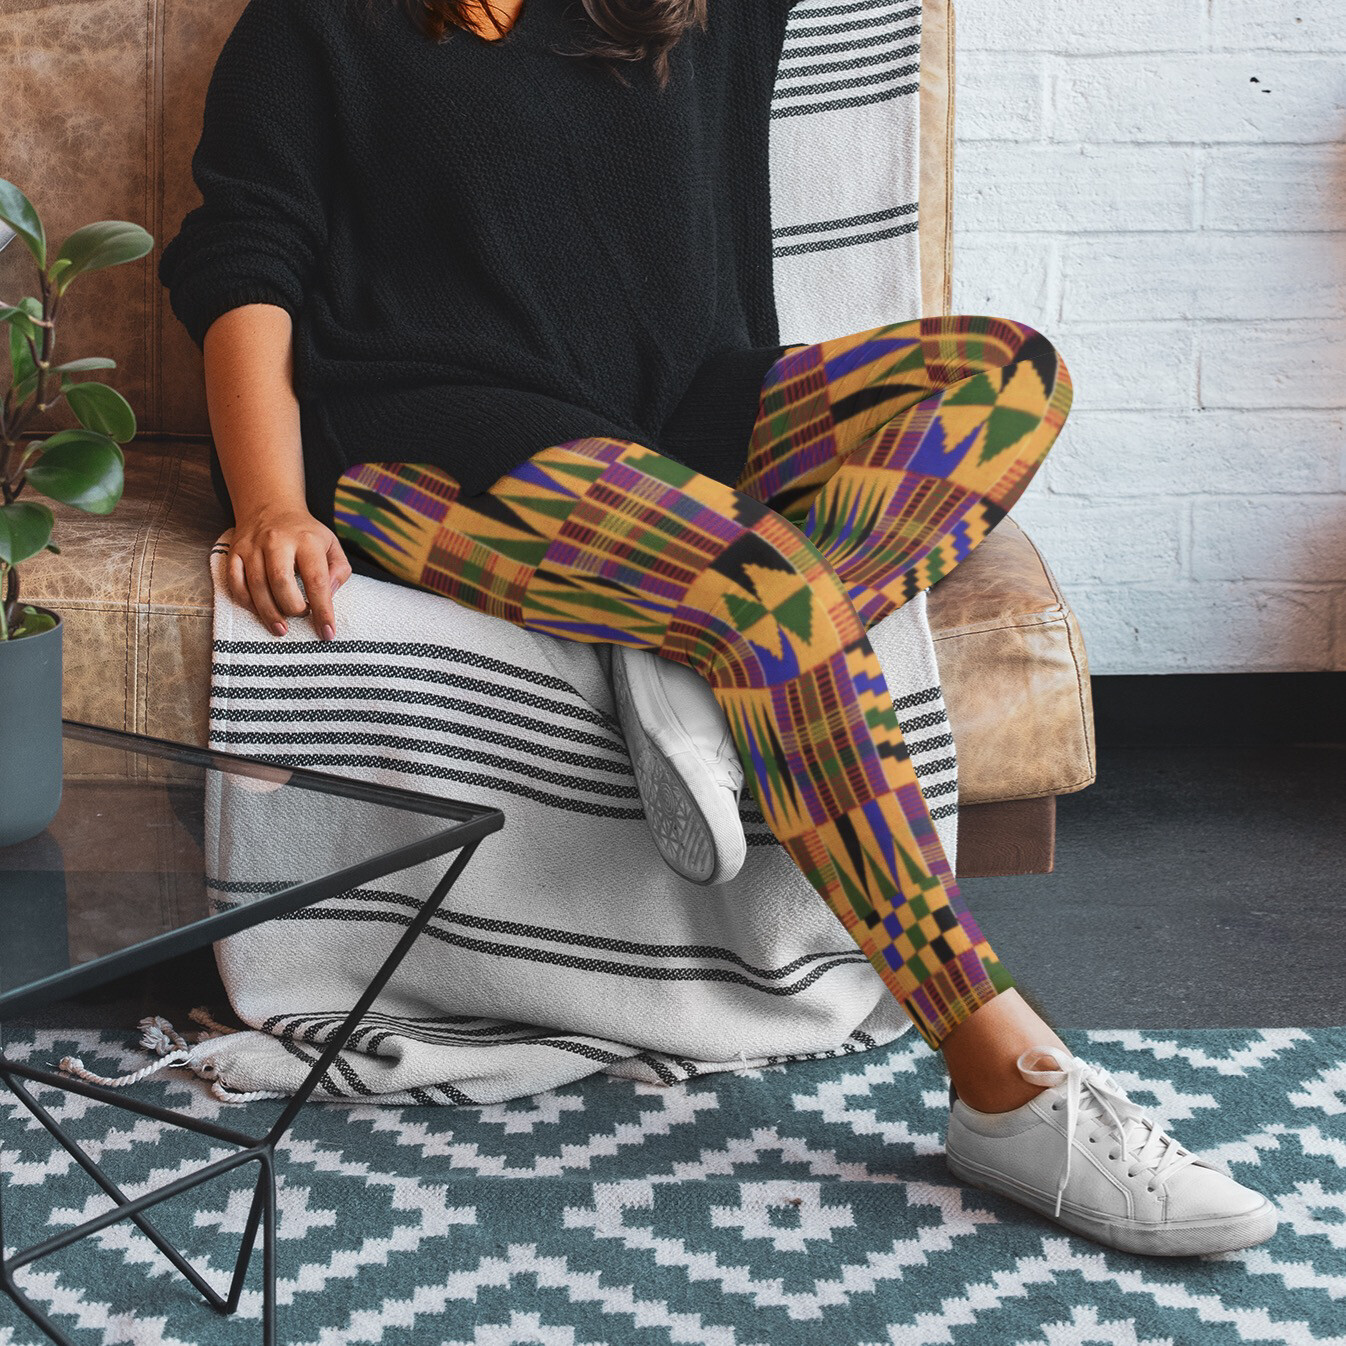 Morowa Kente Plus Size Leggings 2XL-6XL   African Print Leggings   High Waist